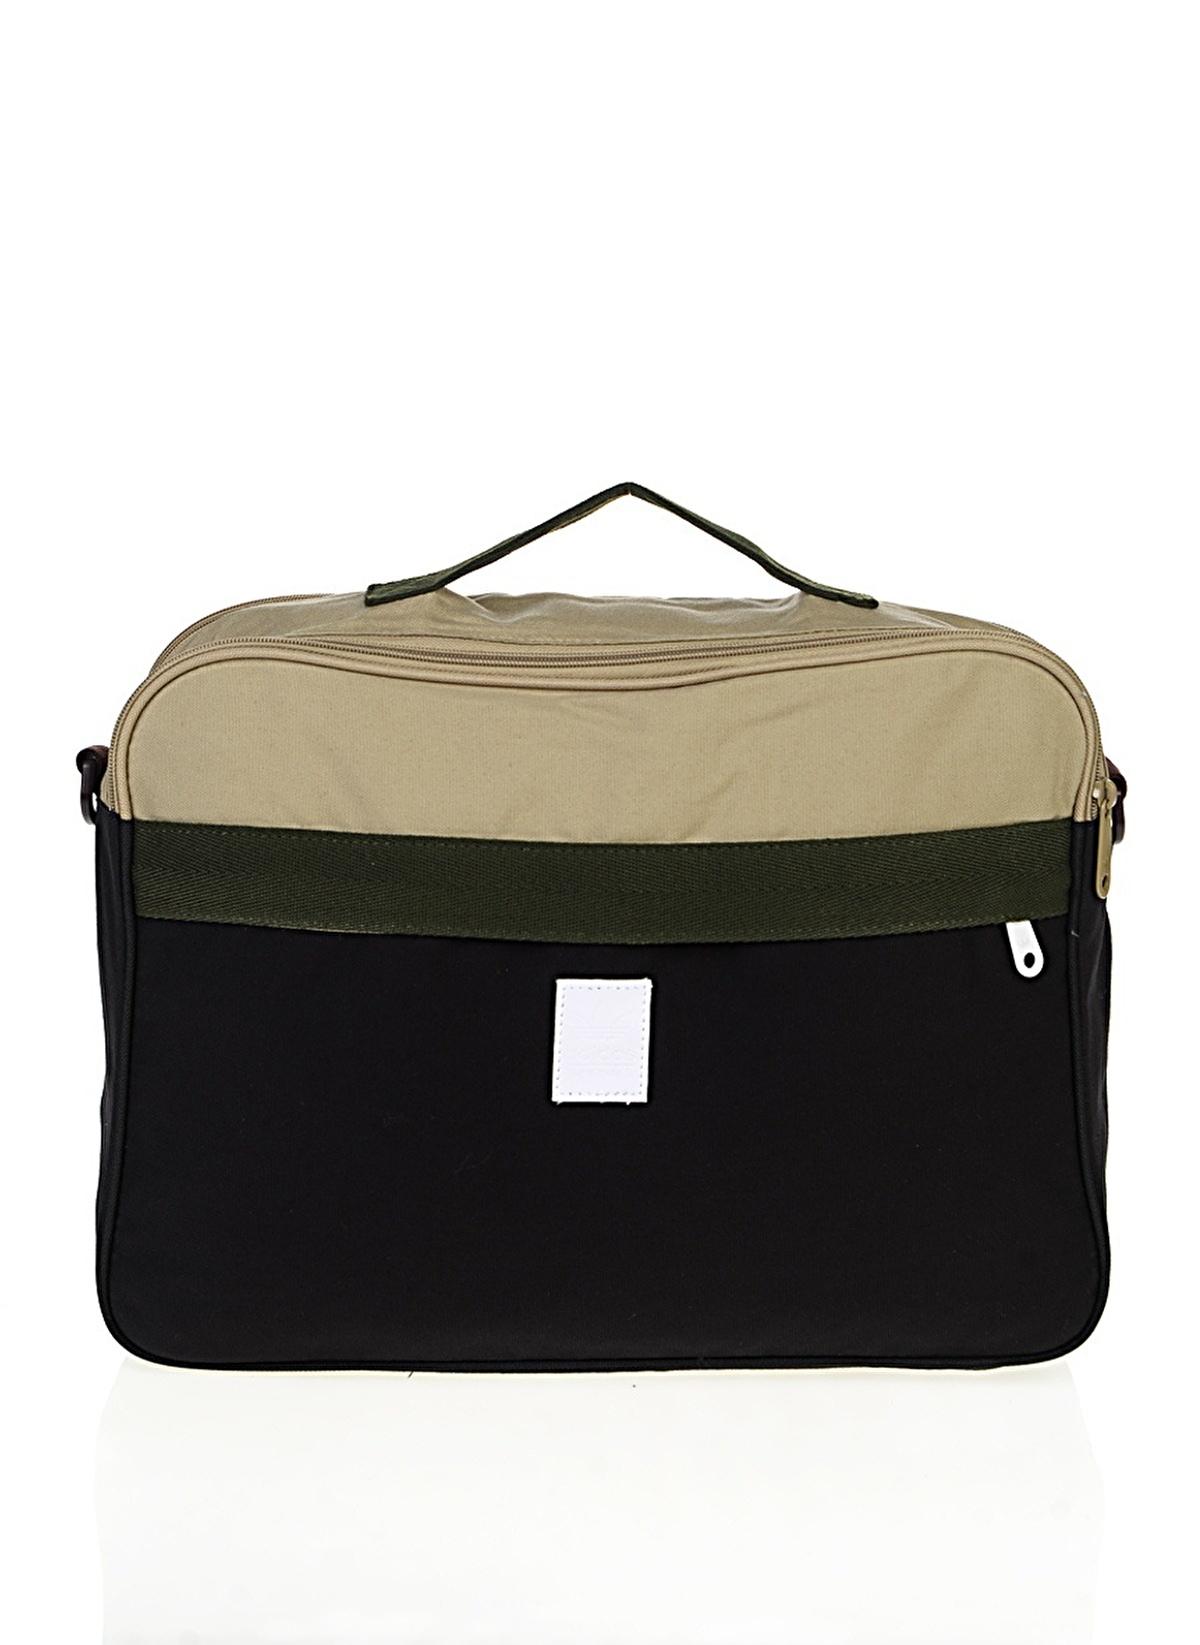 7b32d07b11722 adidas Unisex Laptop /Evrak Çantası Black/Hemp/Ngtred   Morhipo ...